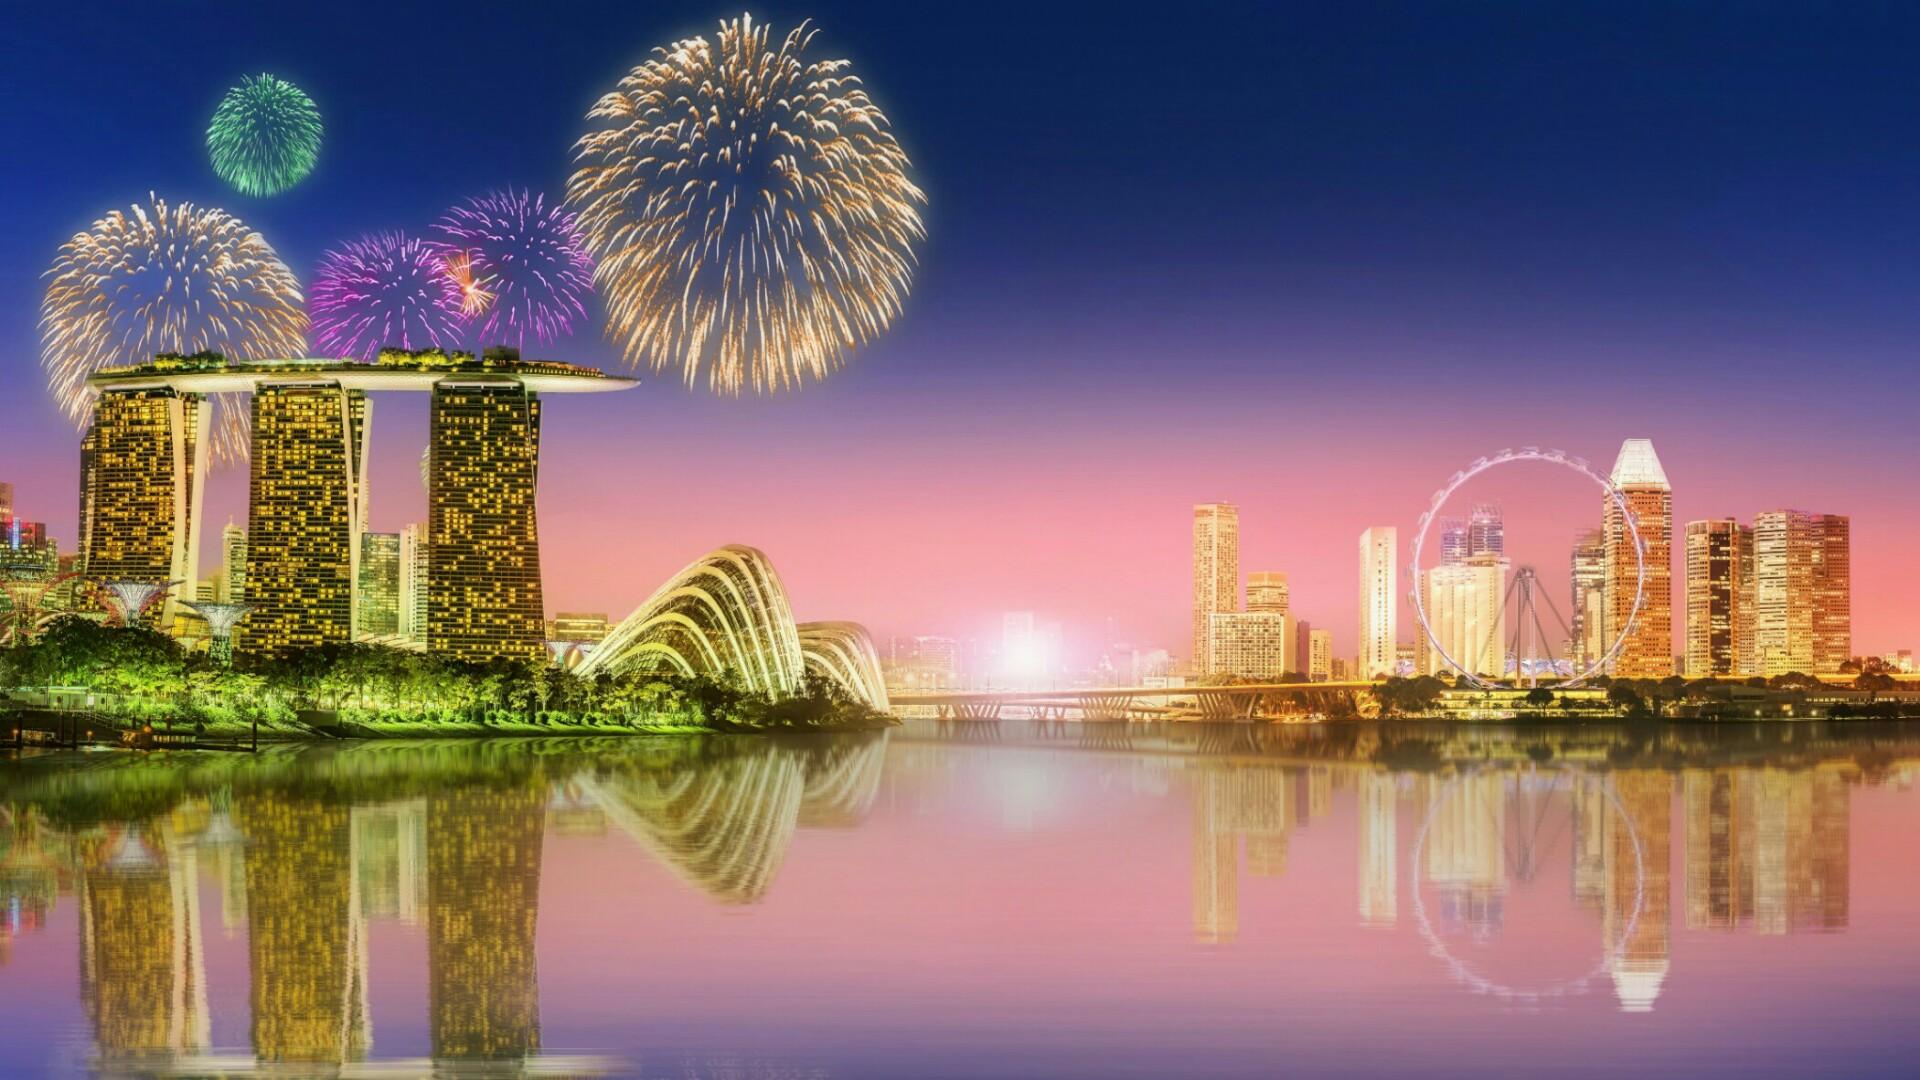 Fireworks in Singapore wallpaper